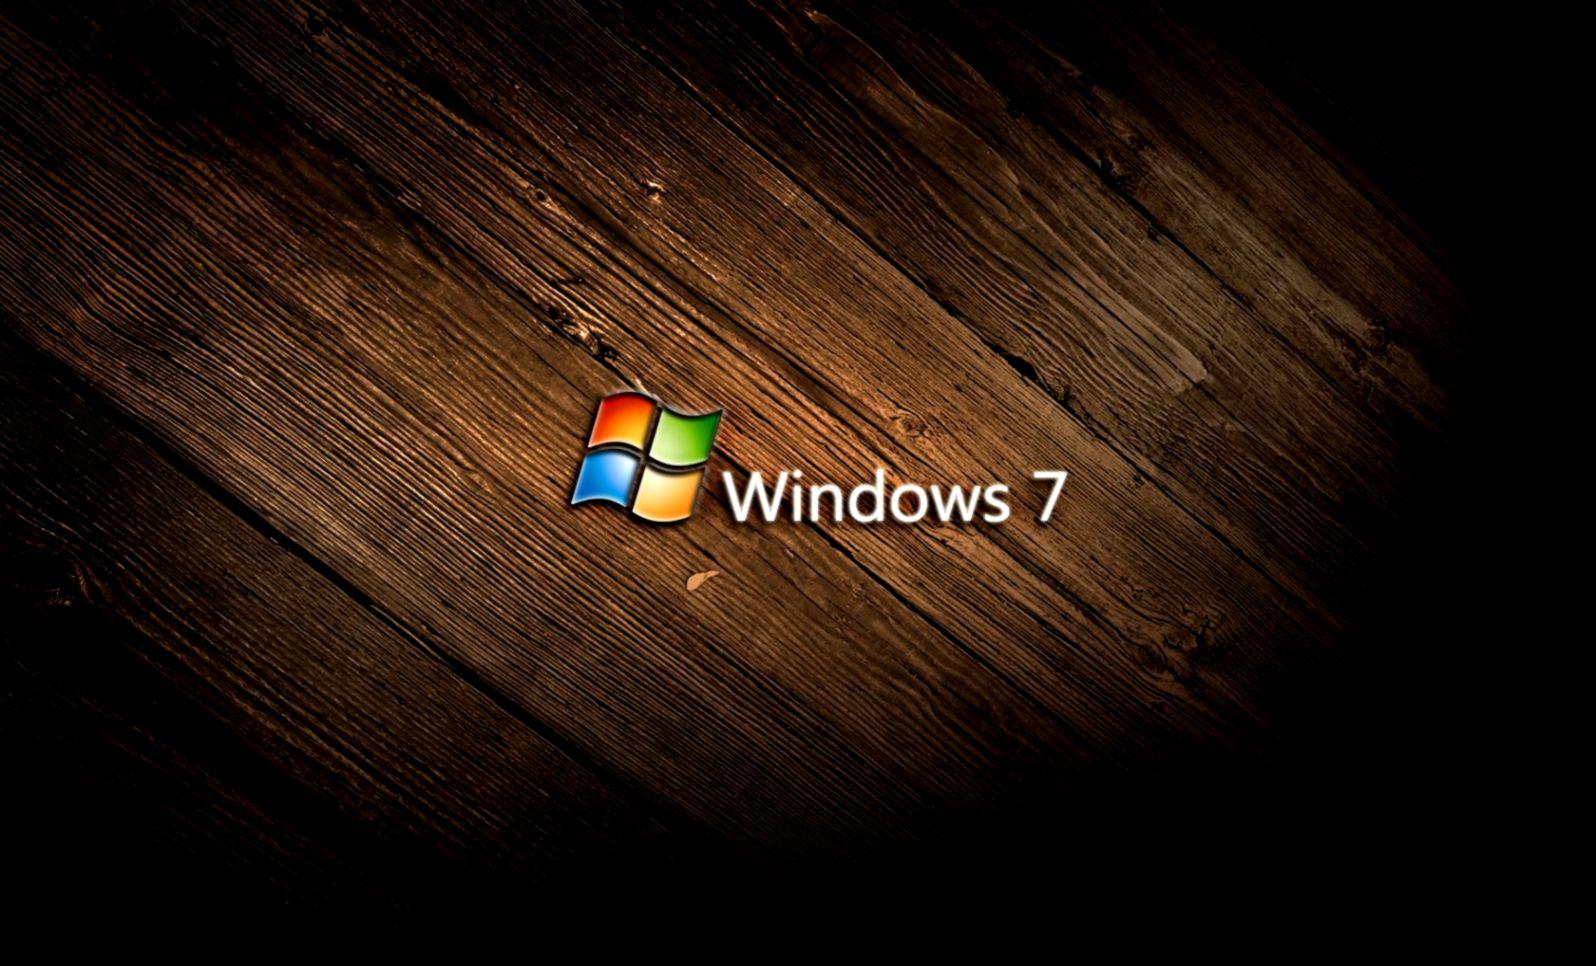 Desktop Background For Windows 7 Hd Wallpapers 1080p 1596x966